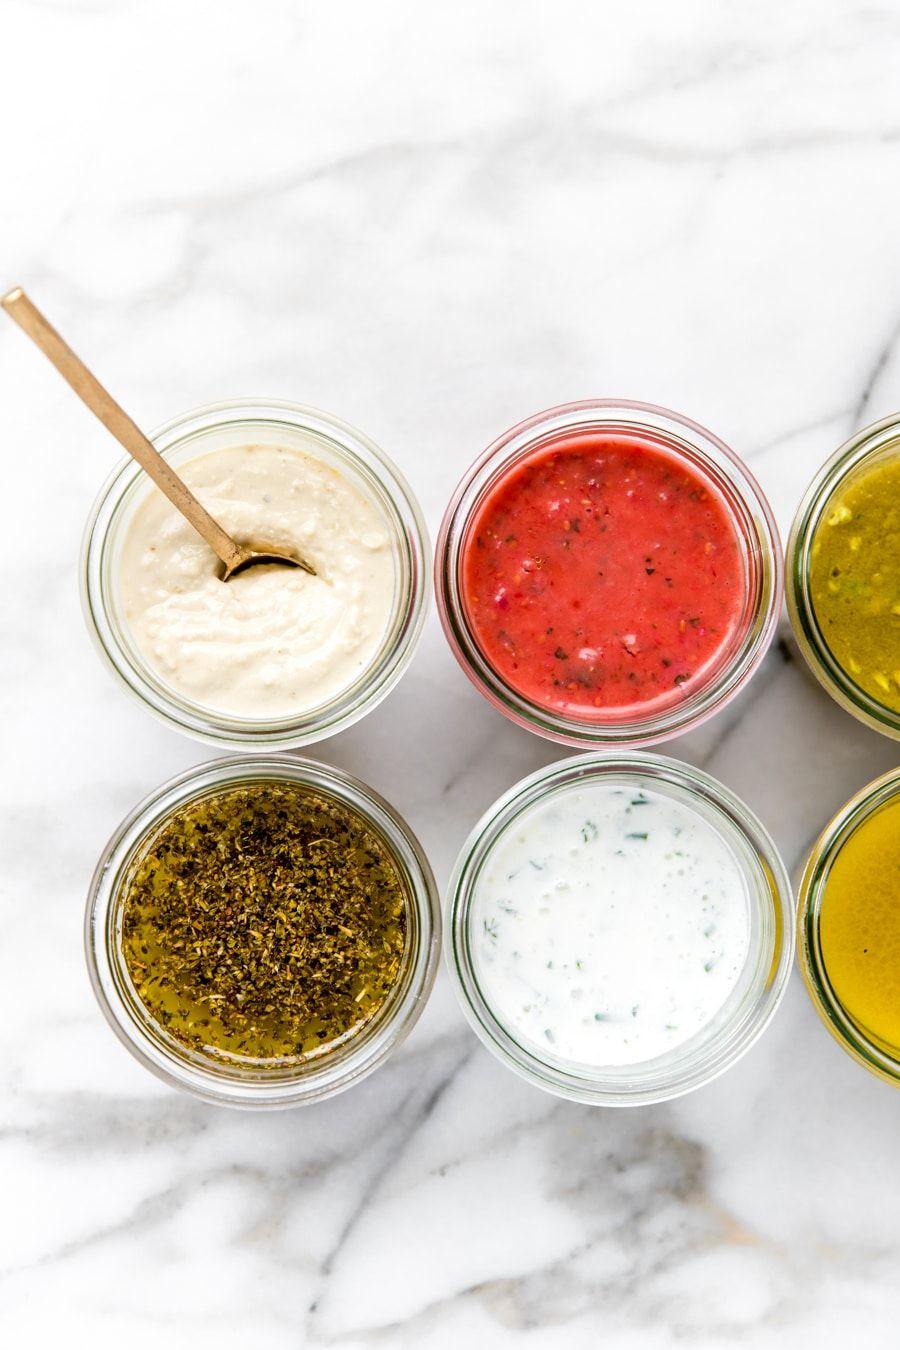 6 Staple Summer Salad Dressings You Ll Actually Love Kroll S Korner Recipe In 2021 Summer Salads Sweet Potato Breakfast Homemade Salads [ 1350 x 900 Pixel ]